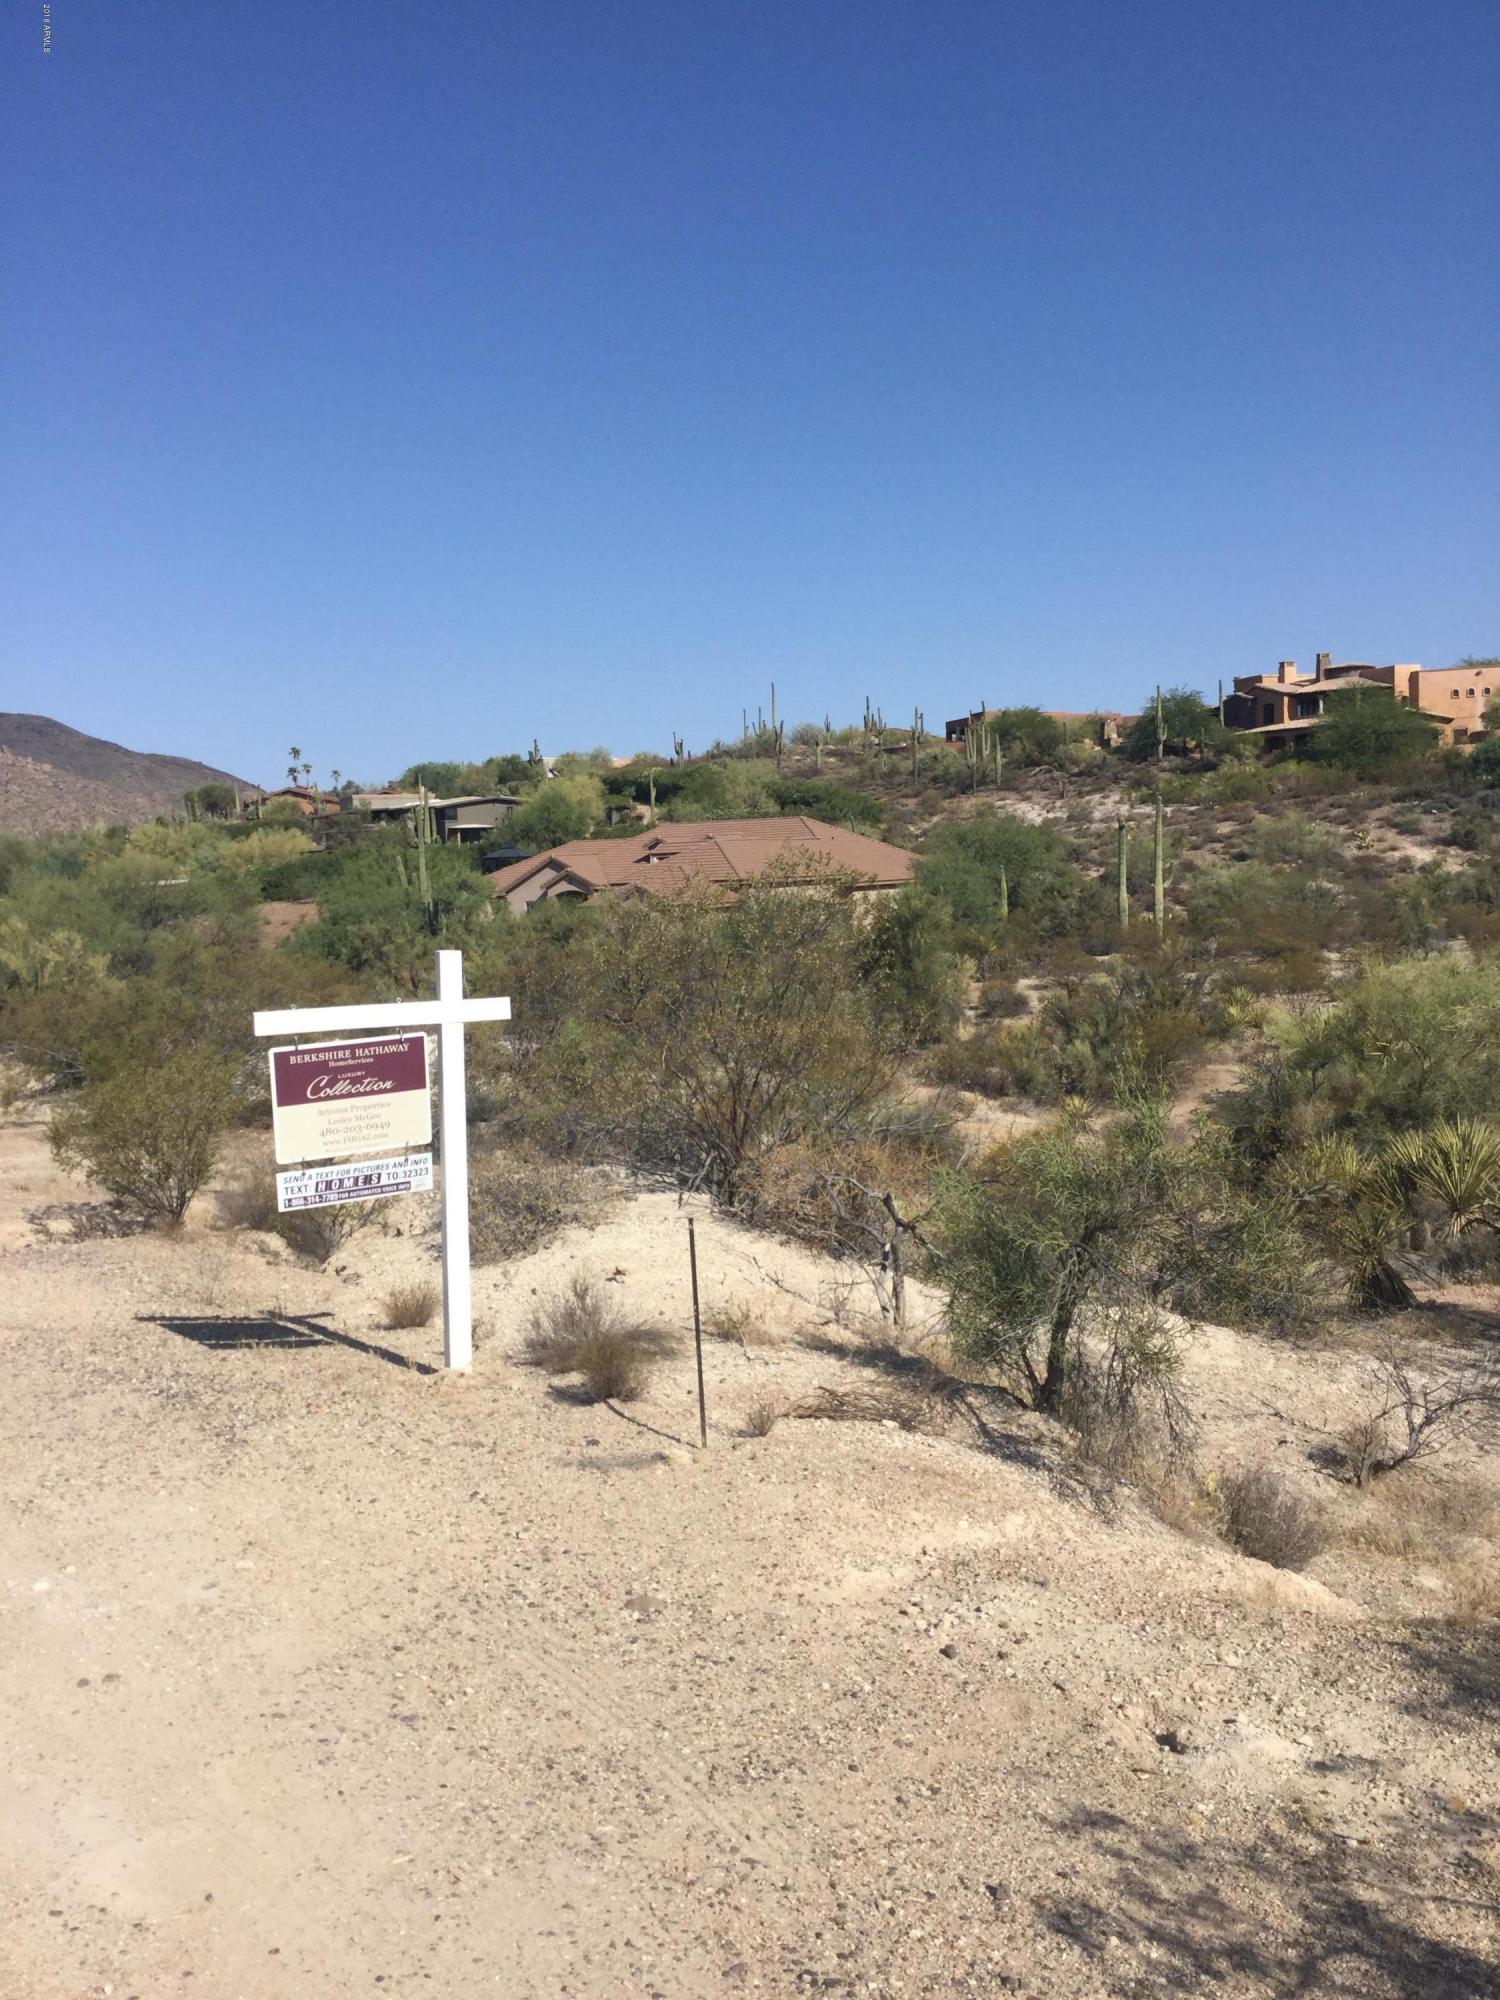 7890 E STAGECOACH PASS Road Lot 148, Carefree, AZ 85377